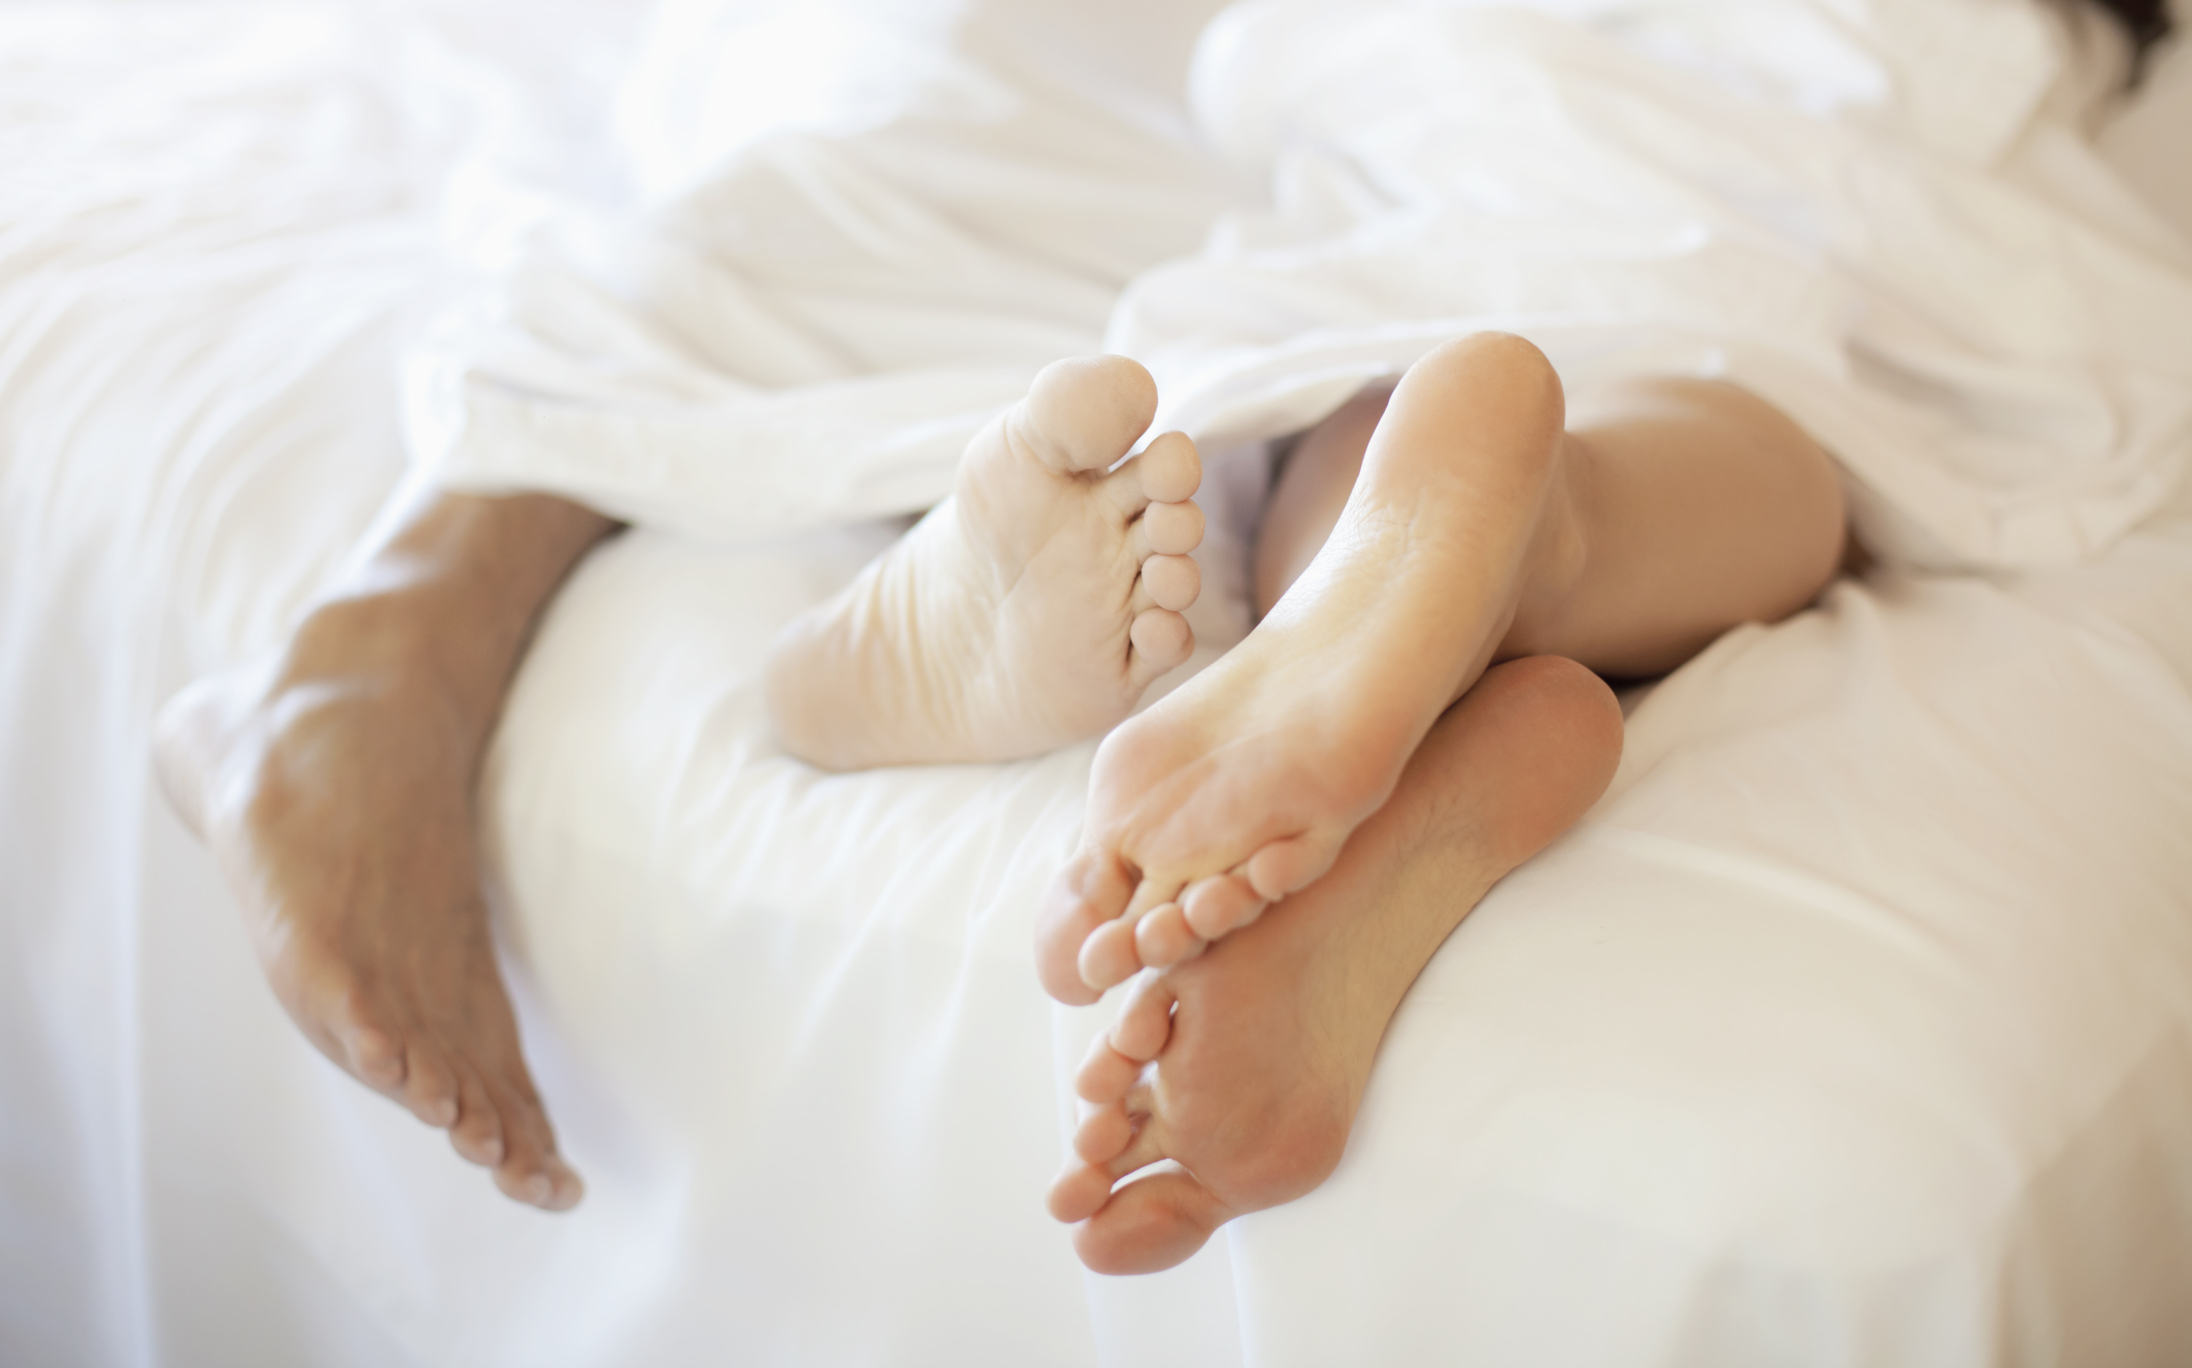 abrupt relationship breakups and sleep